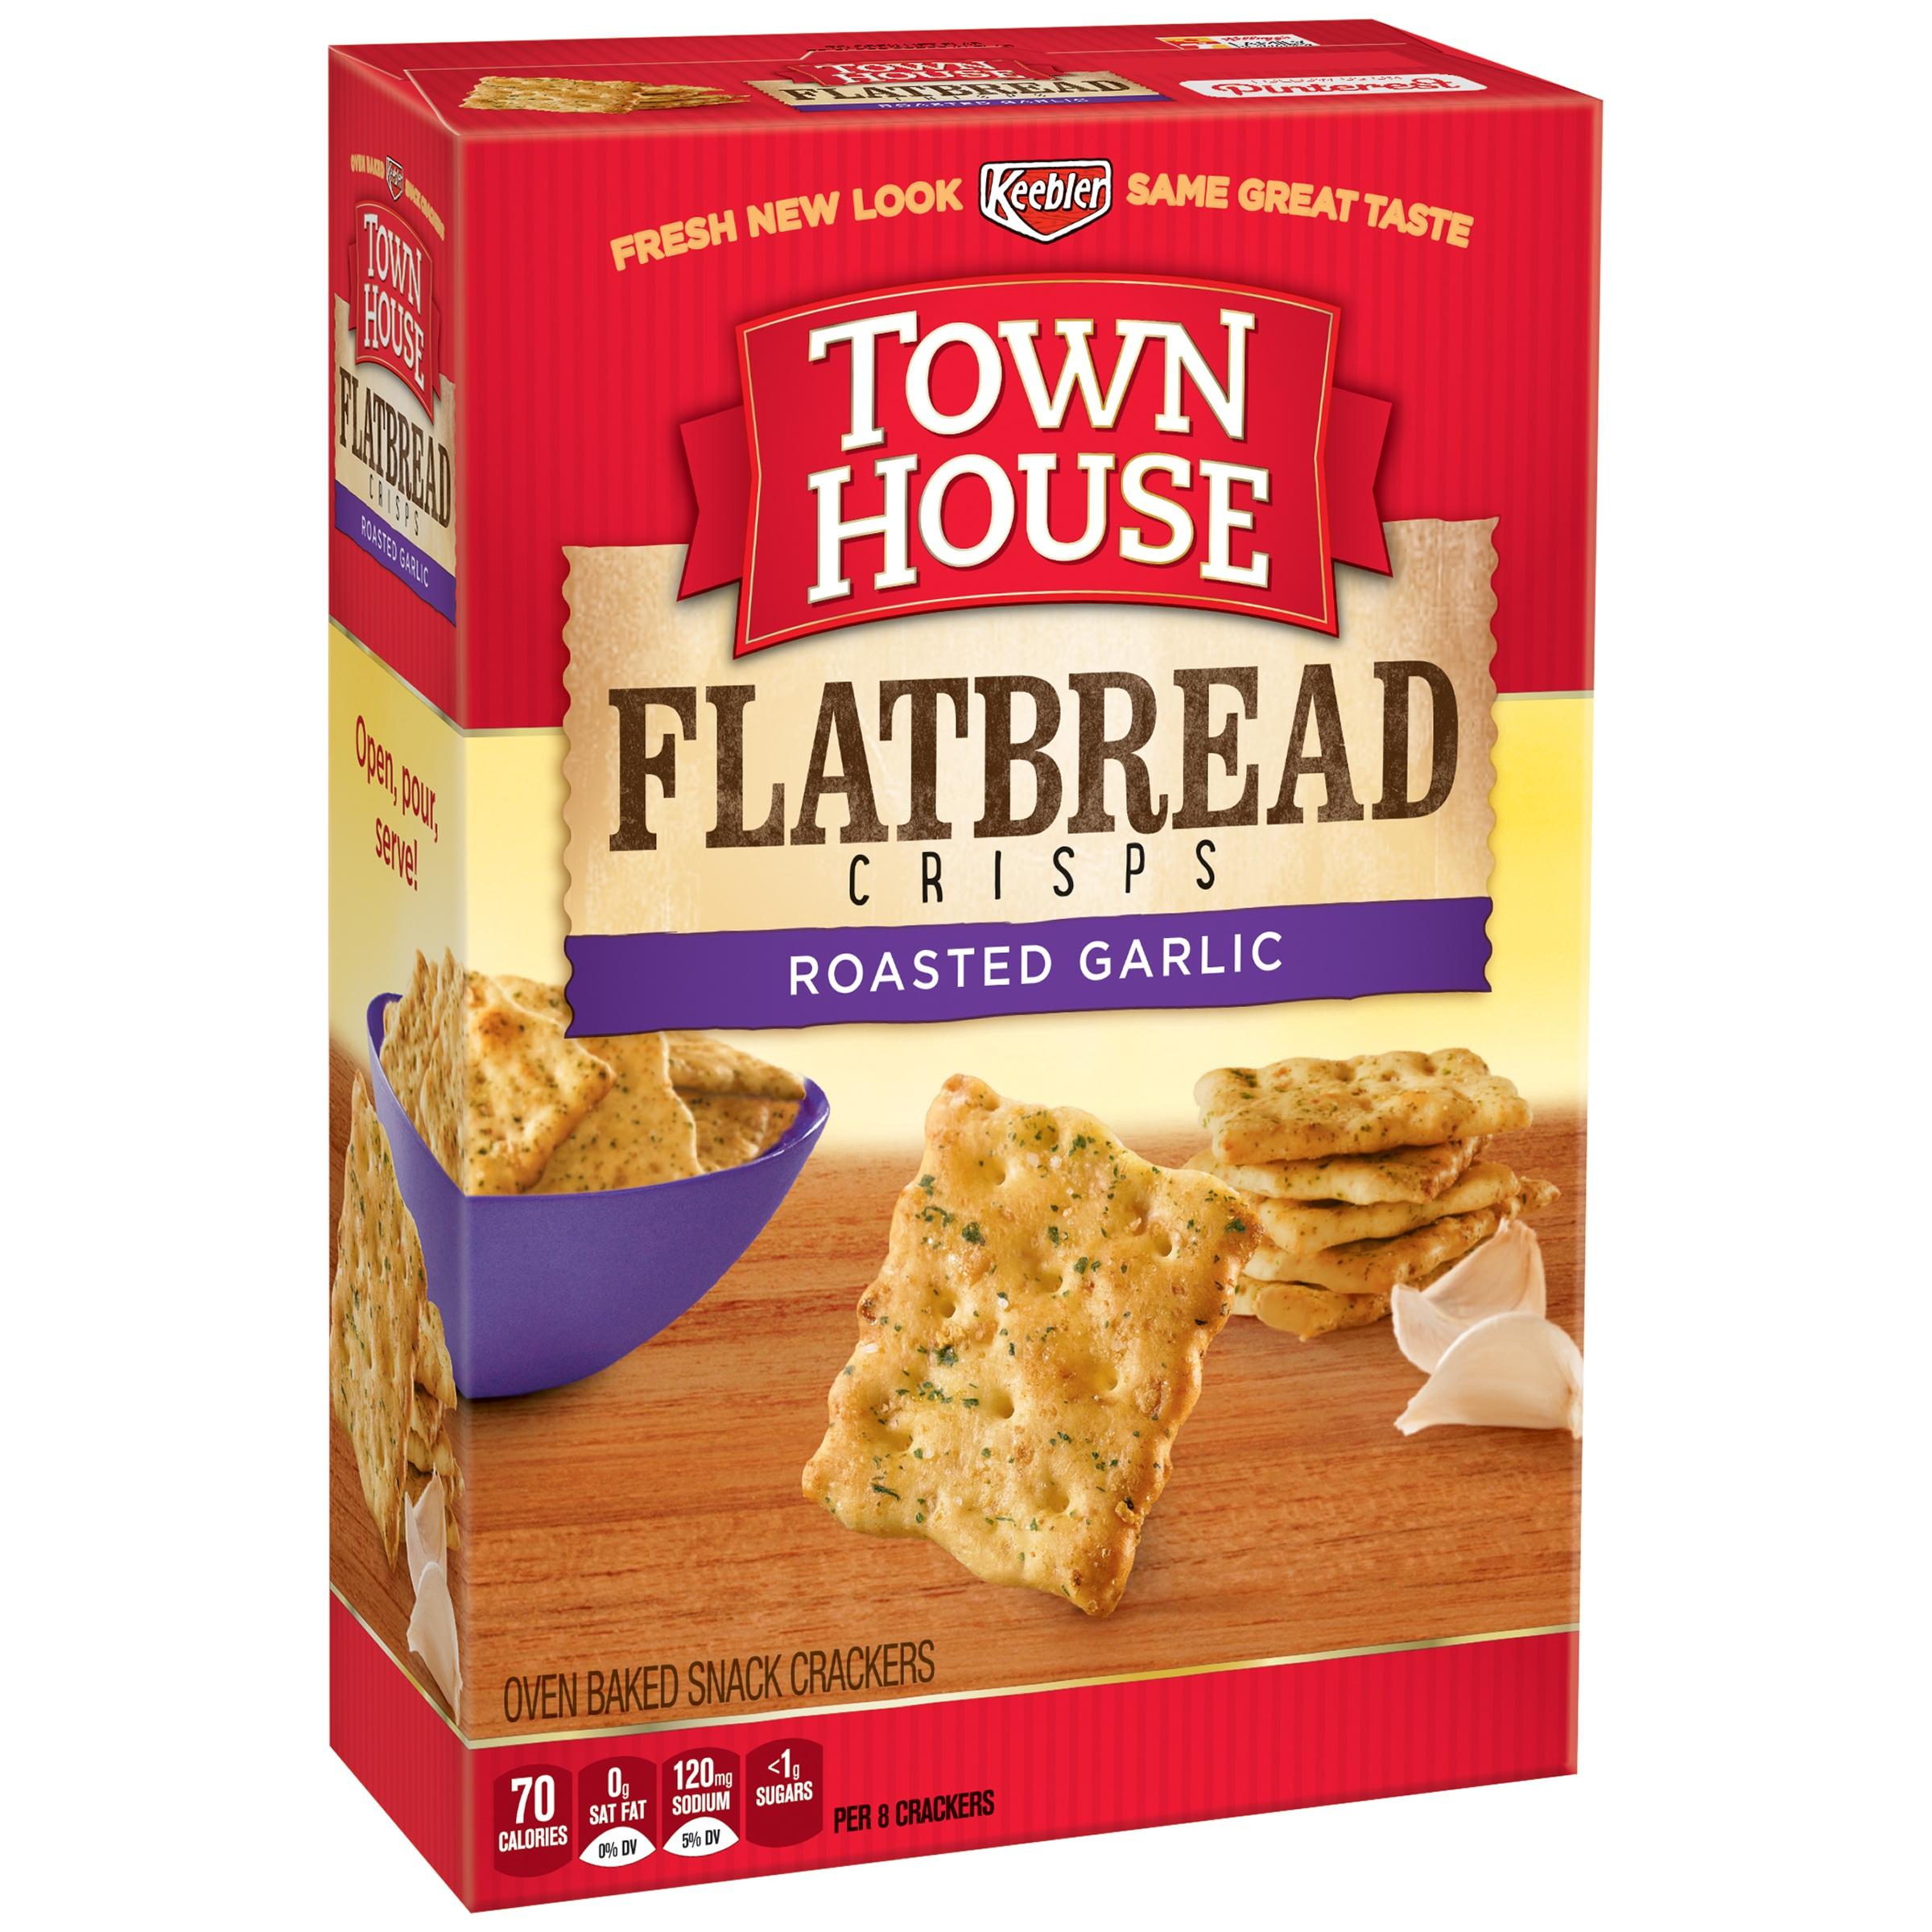 Keebler® Town House® Flatbread Crisps Roasted Garlic Crackers 9.5 oz. Box